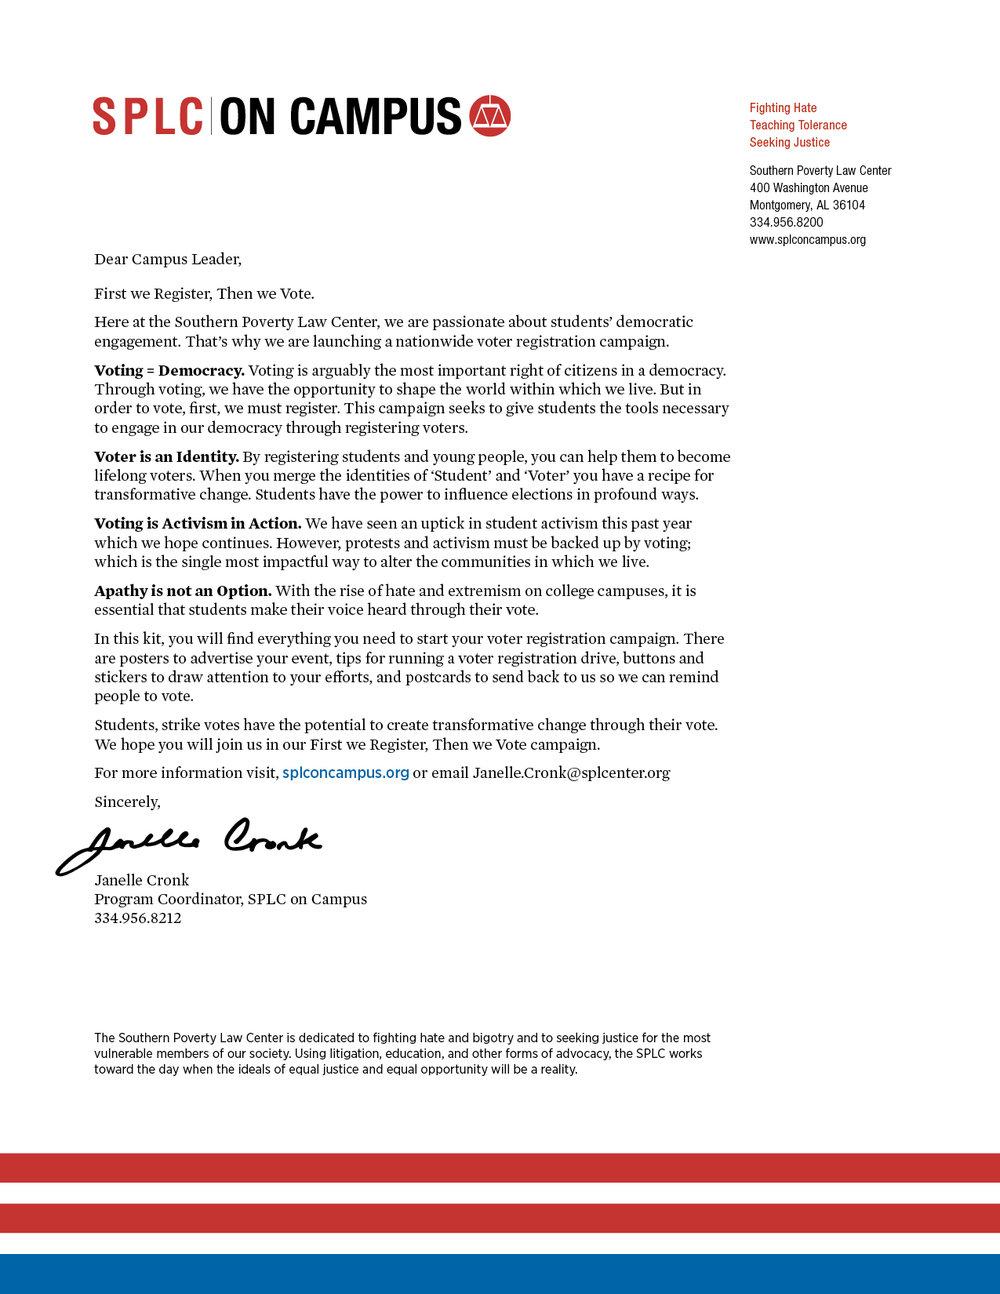 SOC_Vote Box_Campaign Letter_Campus Leaders_Thumbnail.jpg